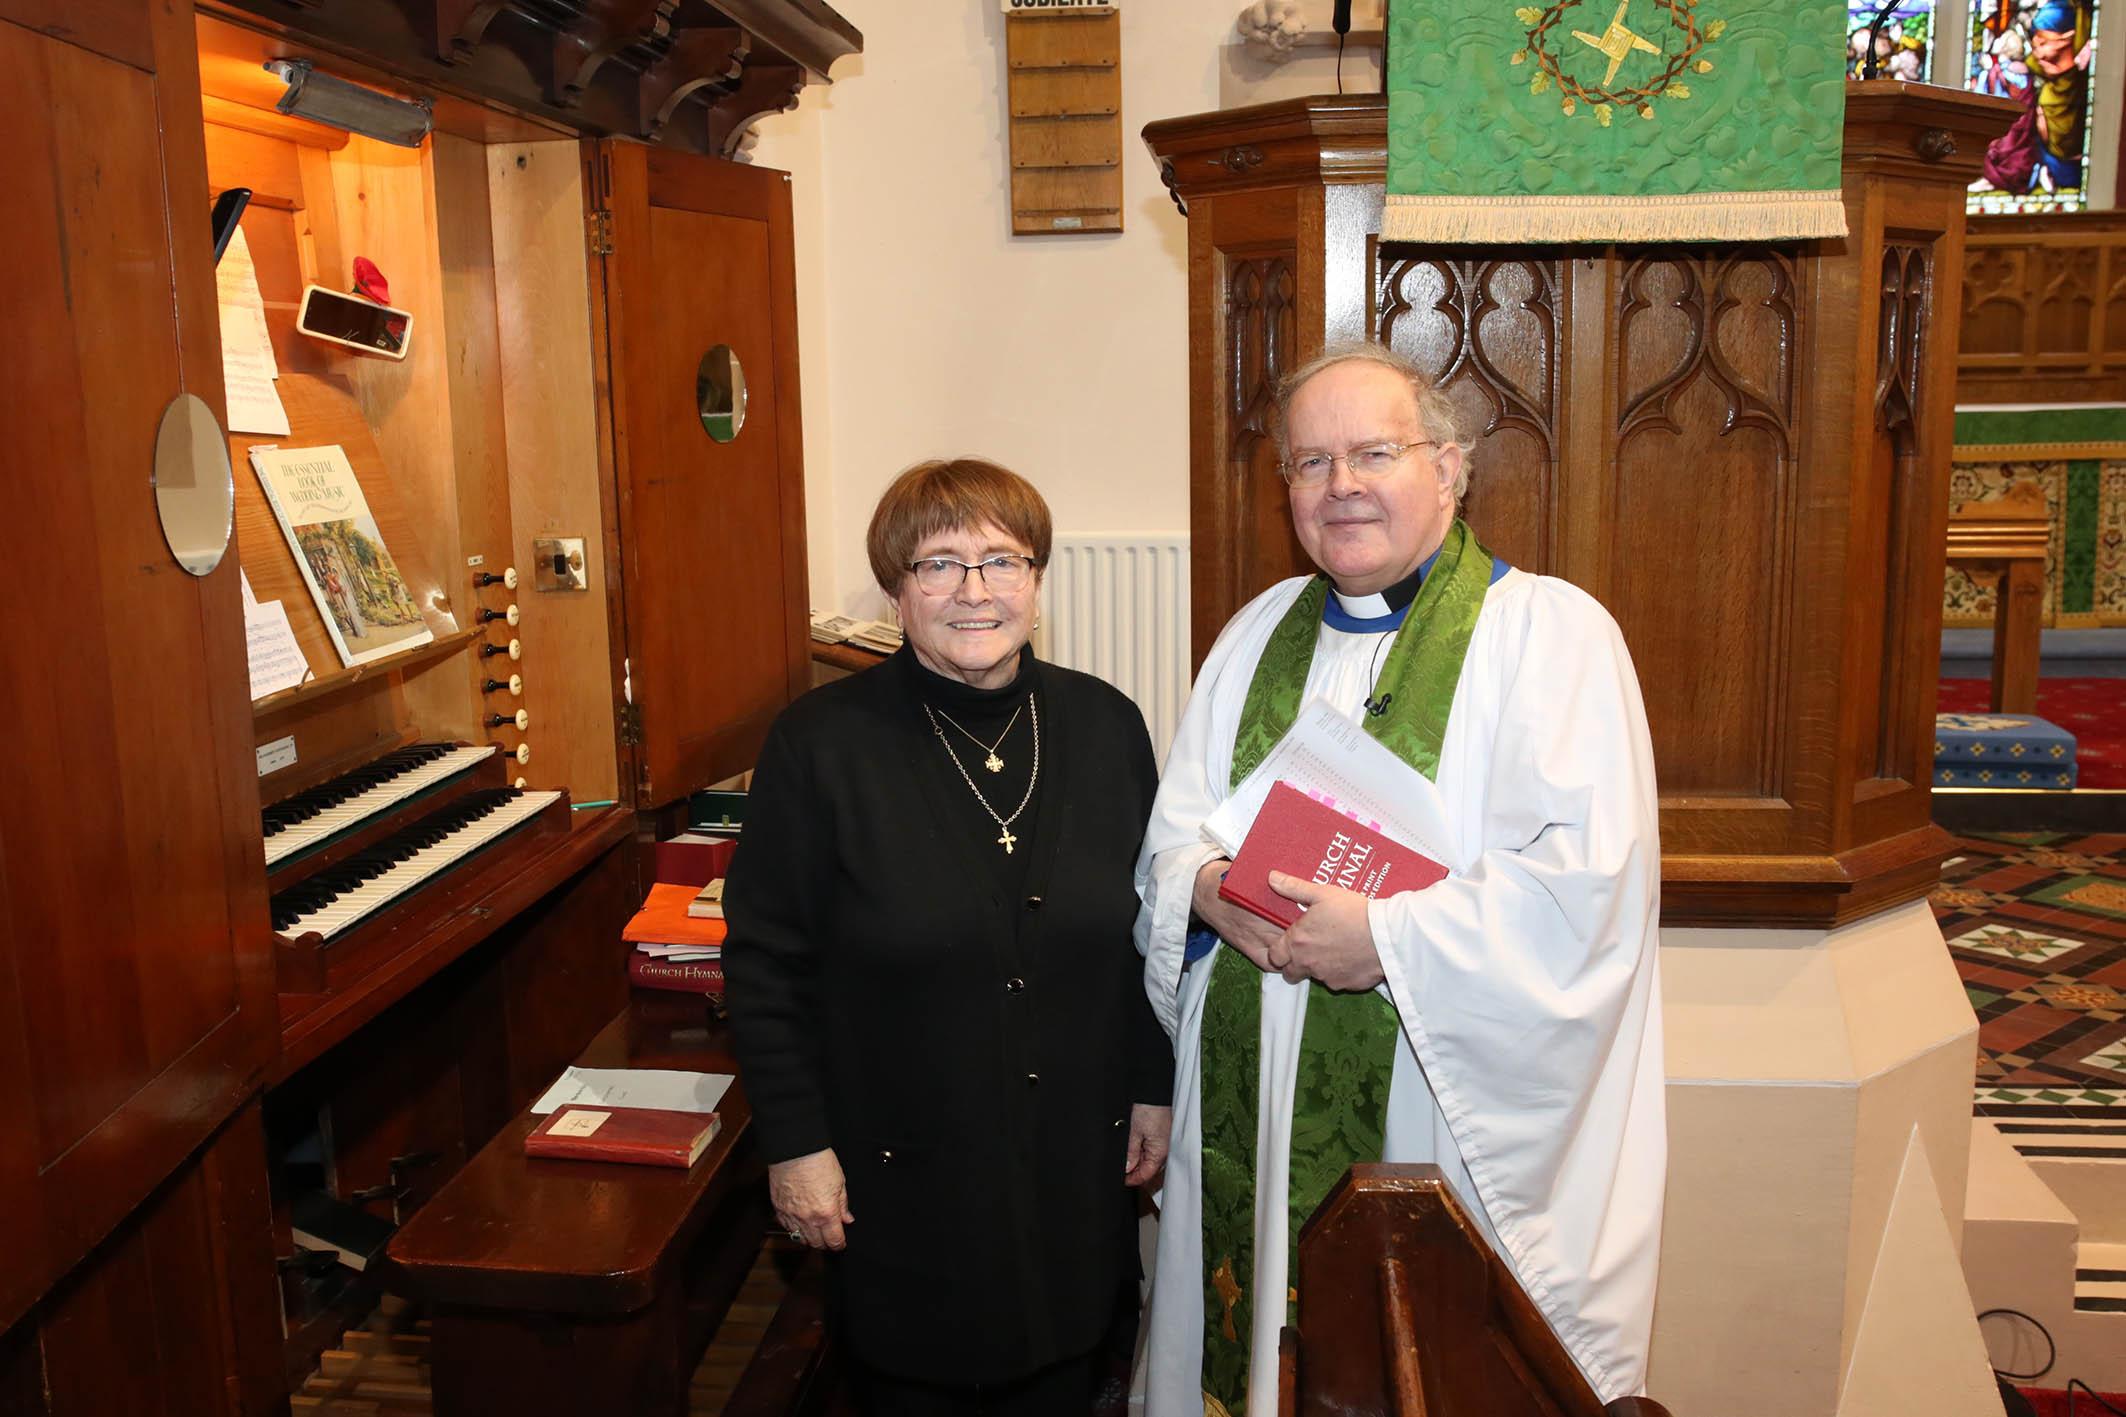 Valerie Ireland with David Humphries